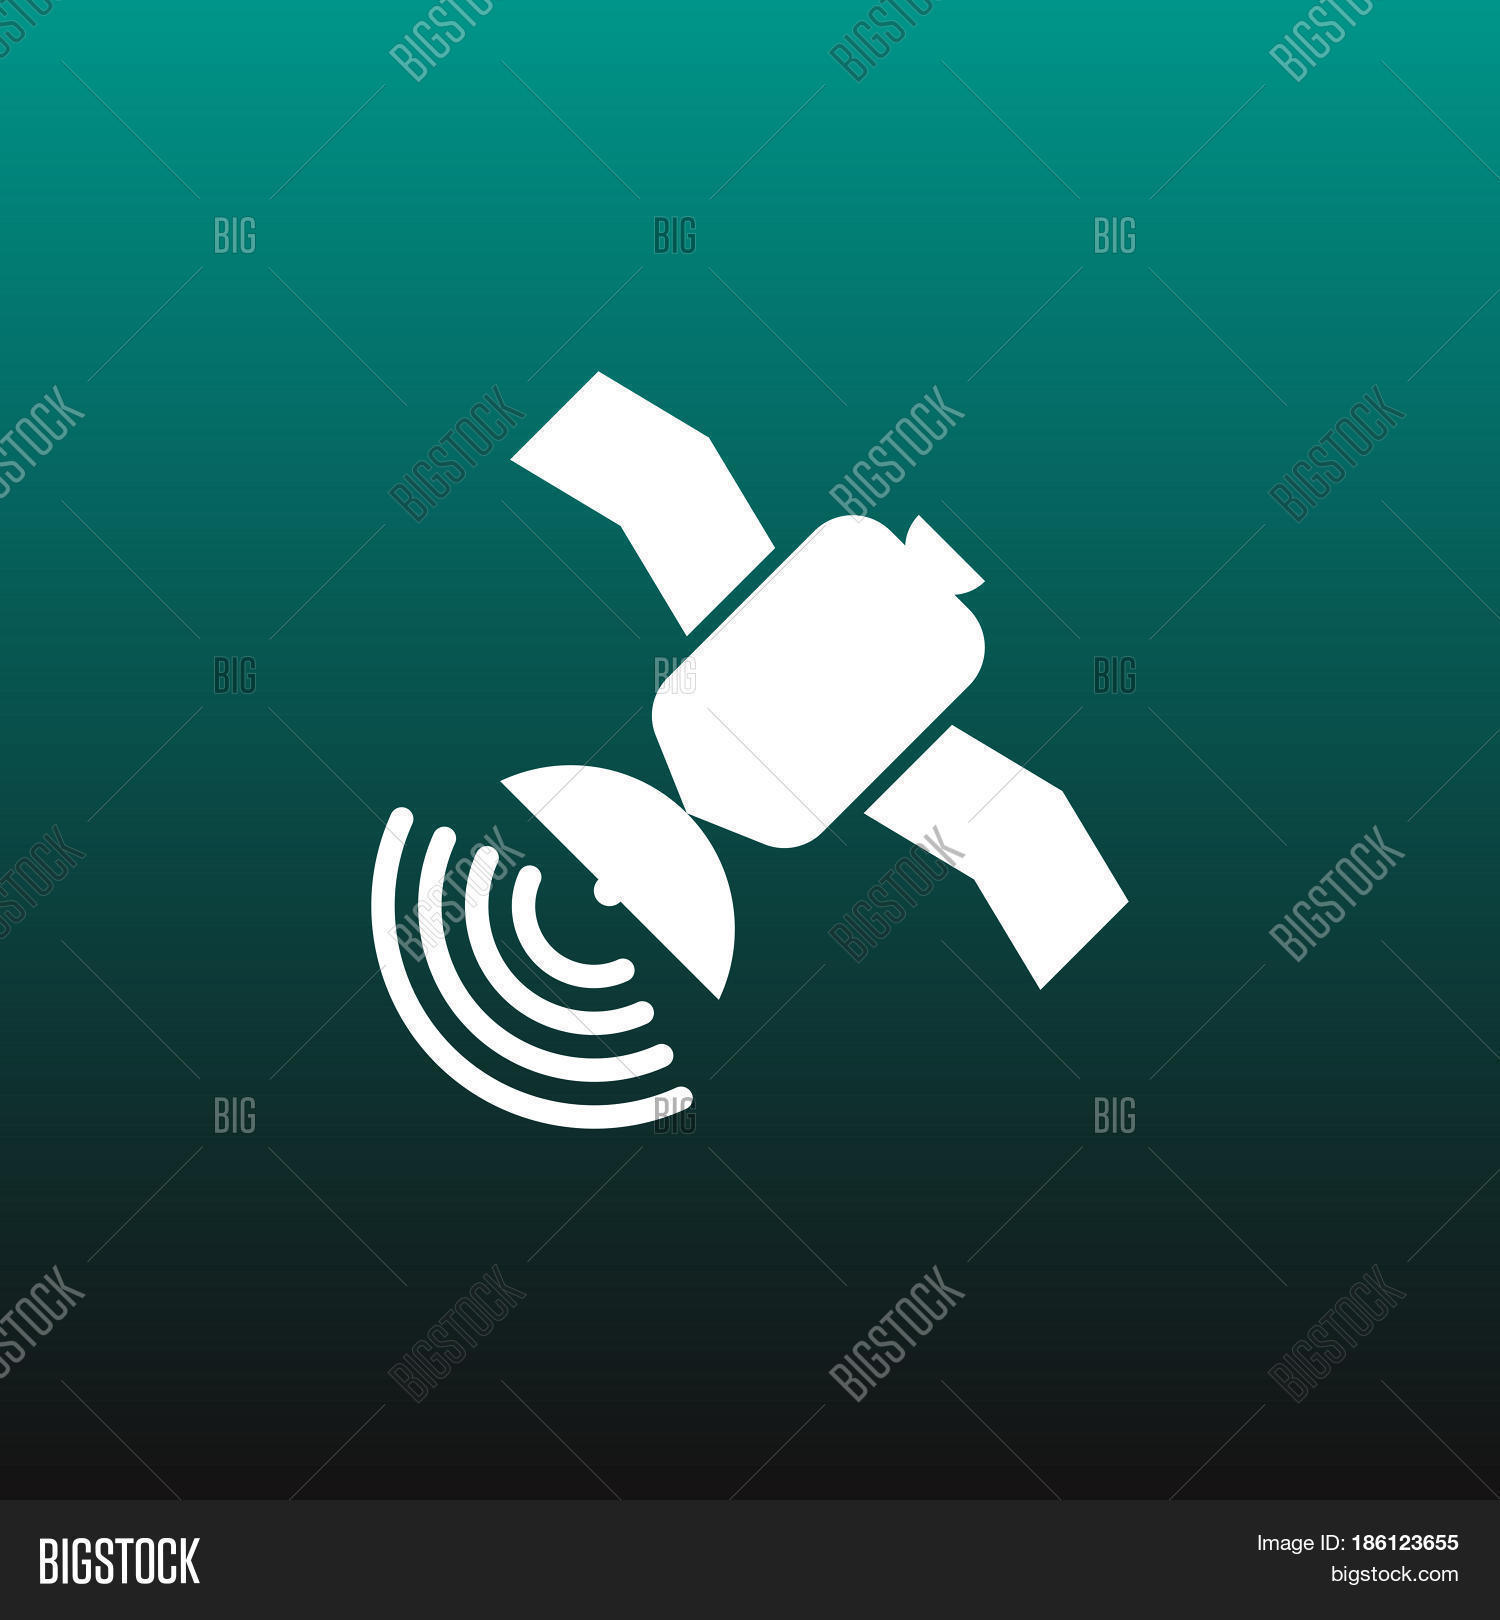 Satellite Vector Icon Isolated On Vector & Photo   Bigstock